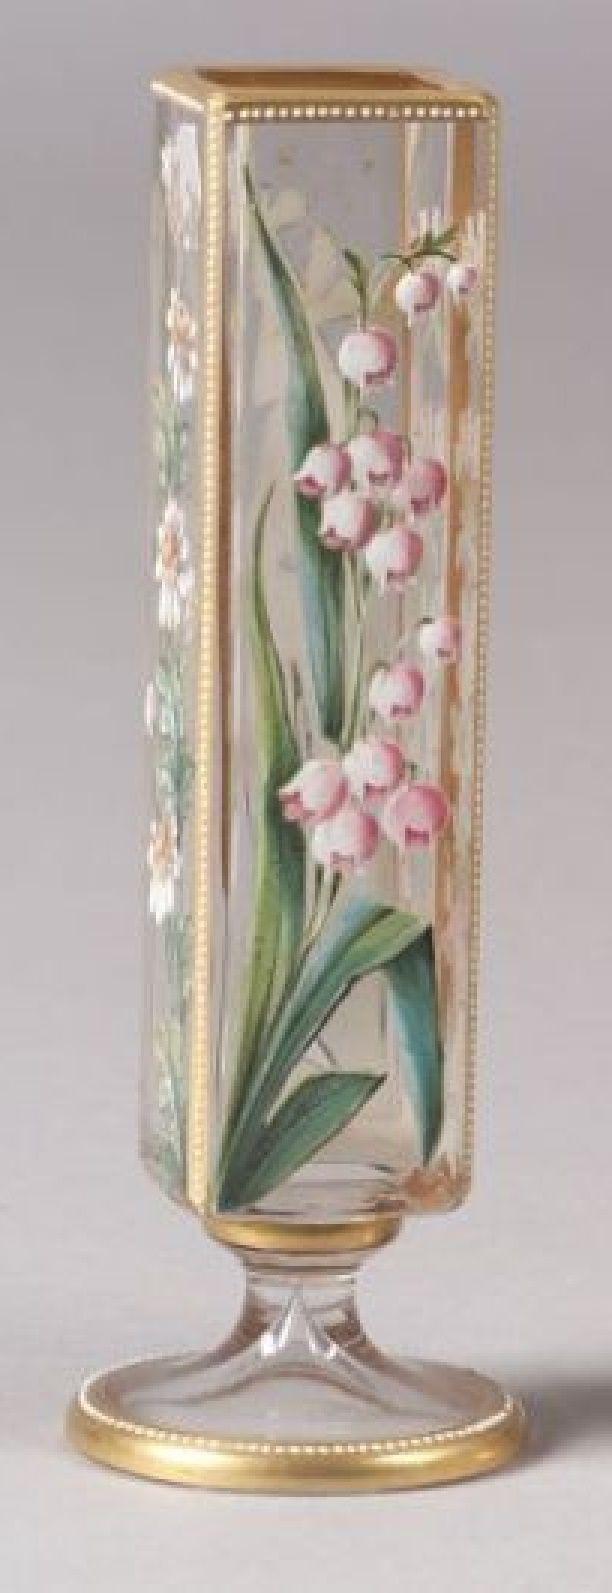 enameled glass vases Possibly Lobmeyer Austria late